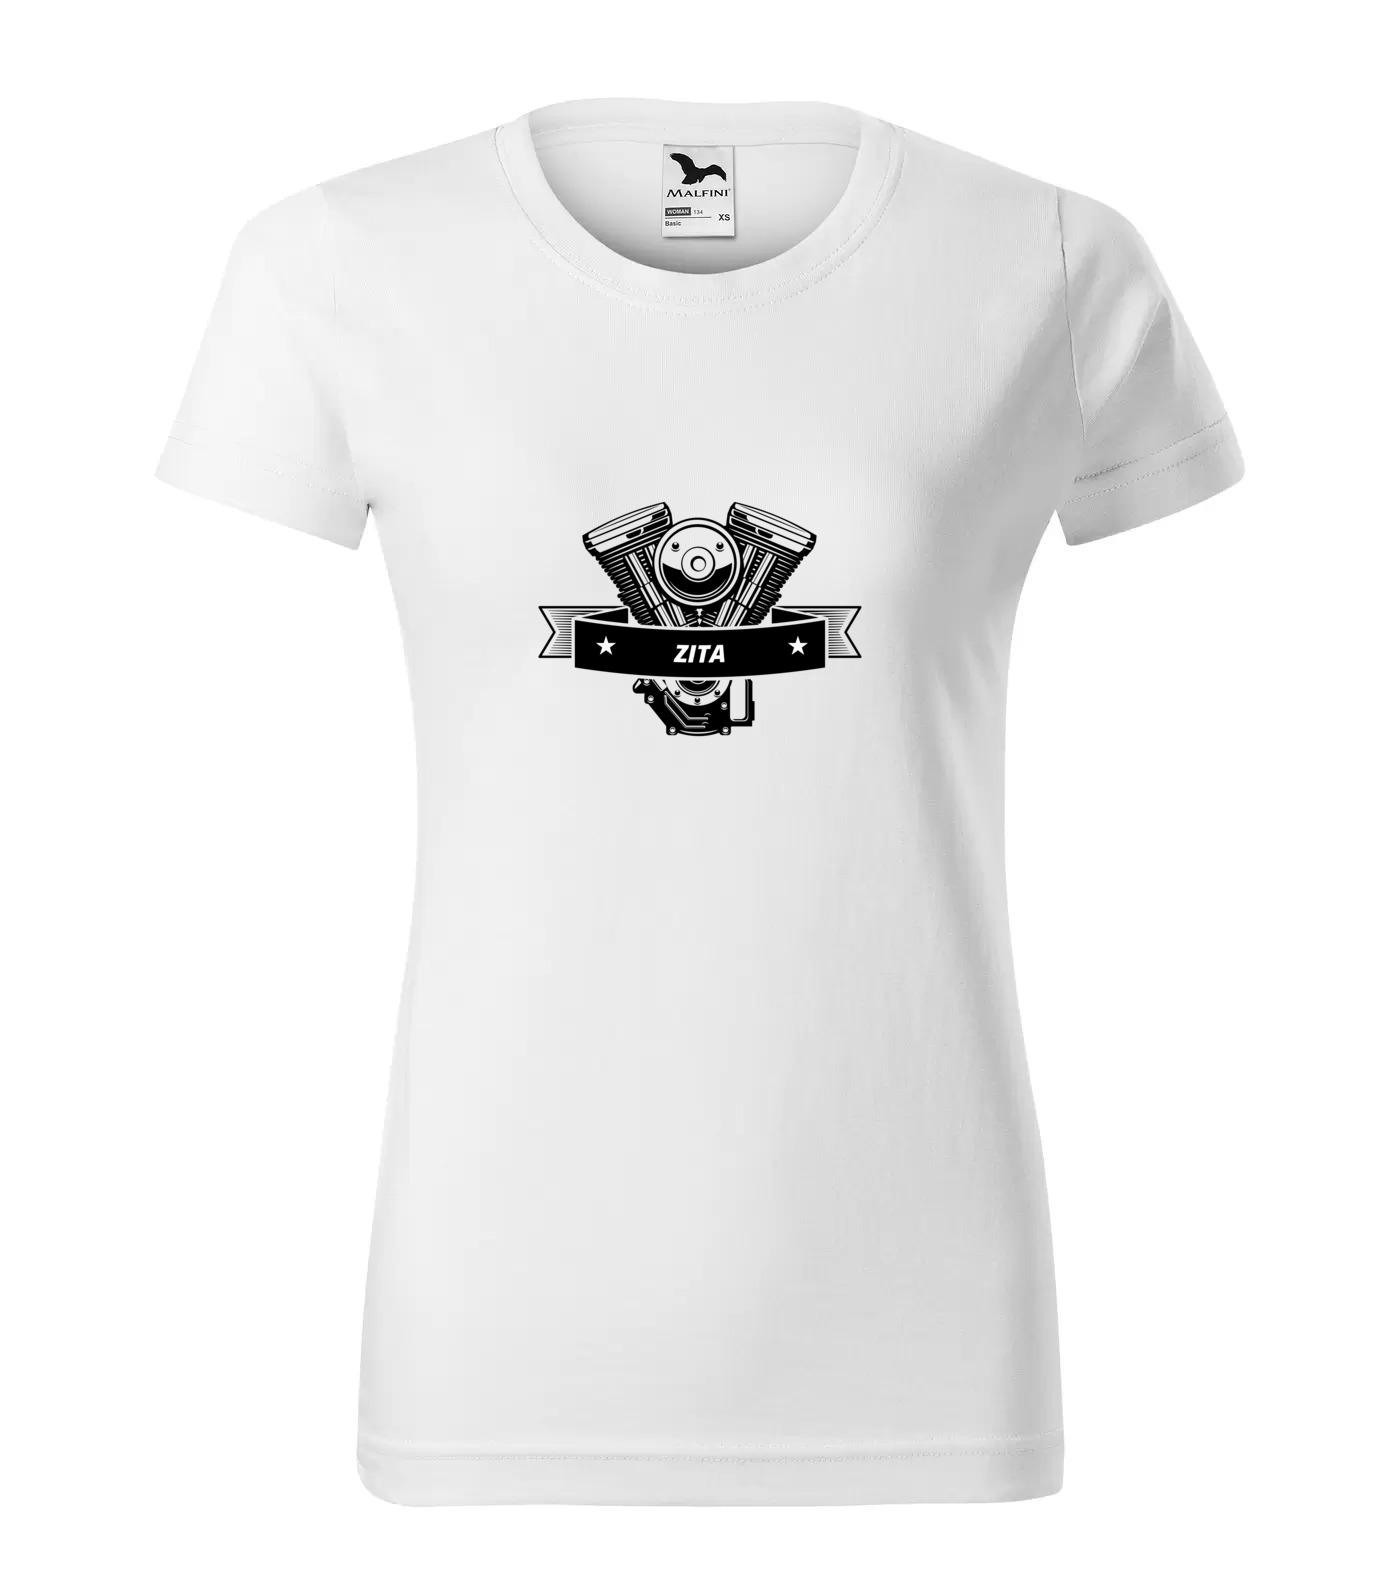 Tričko Motorkářka Zita